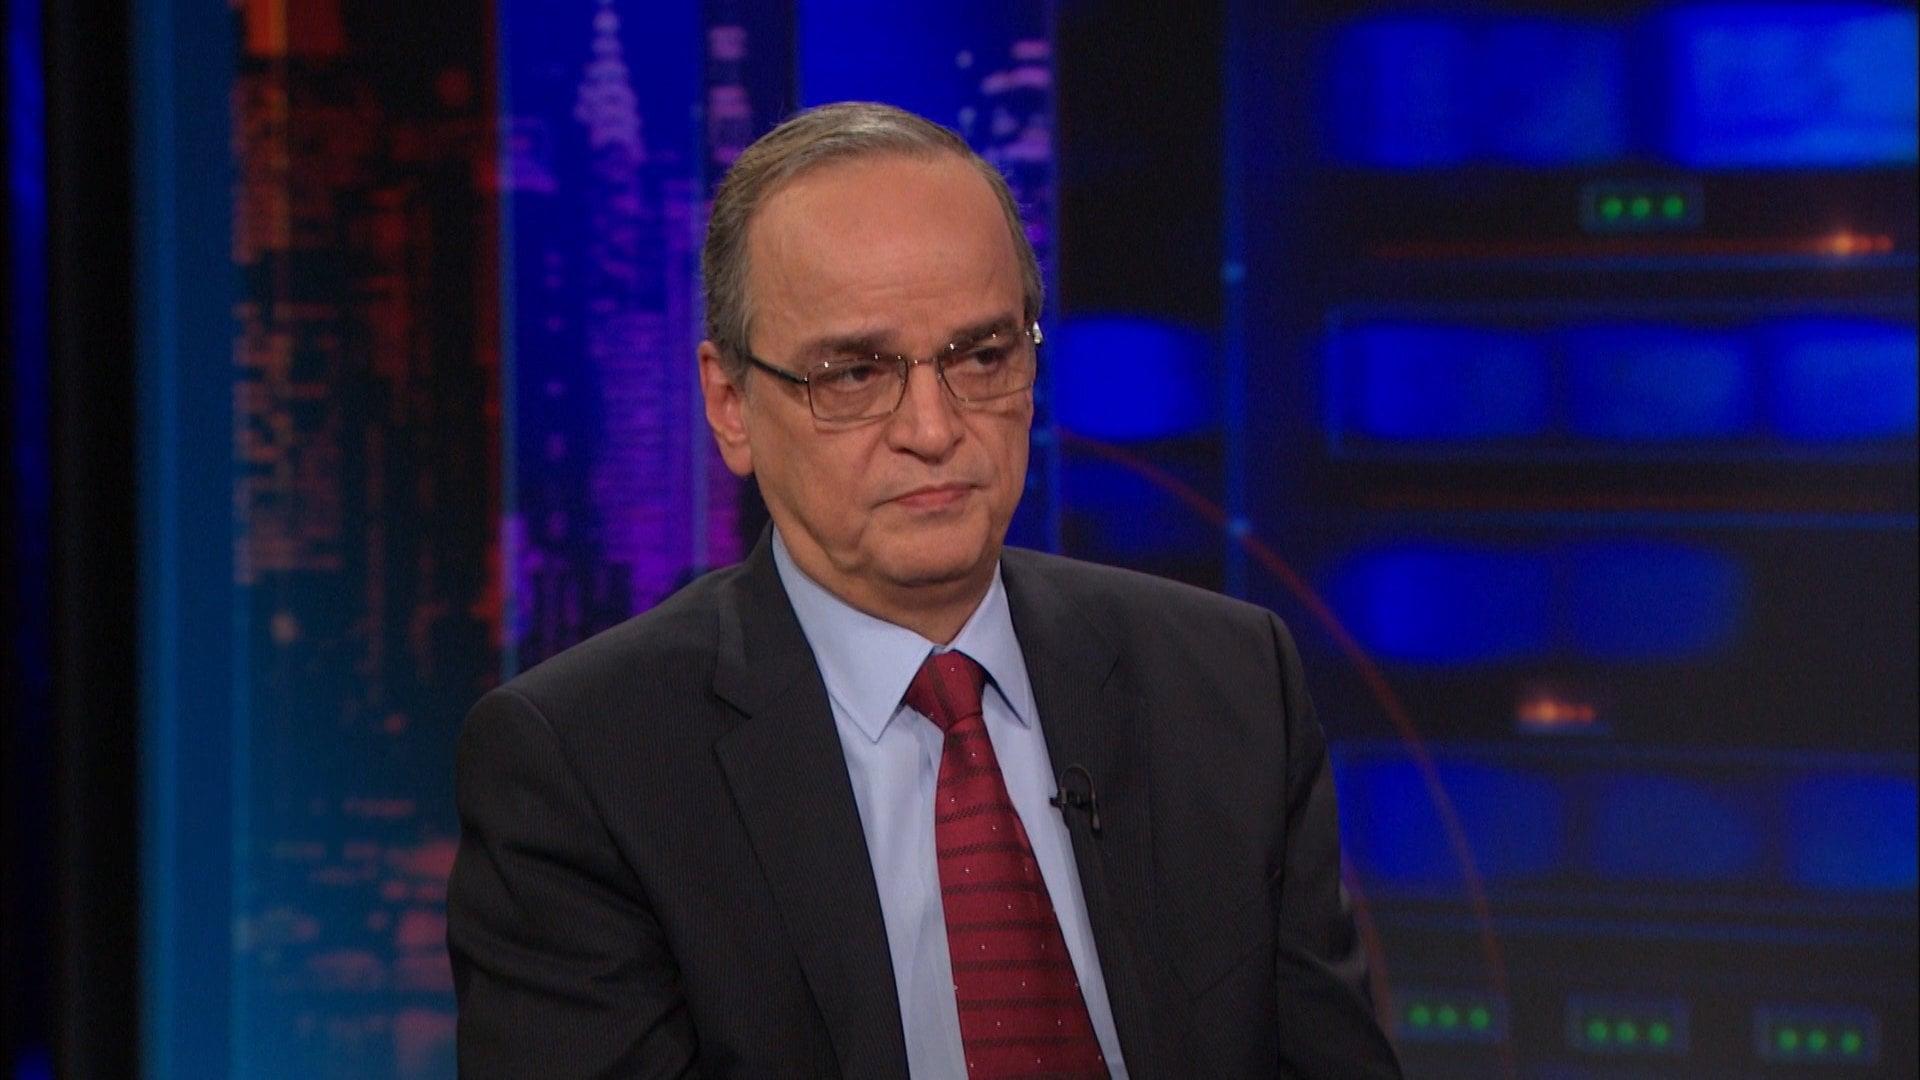 The Daily Show with Trevor Noah Season 20 :Episode 1  Hadi al-Bahra